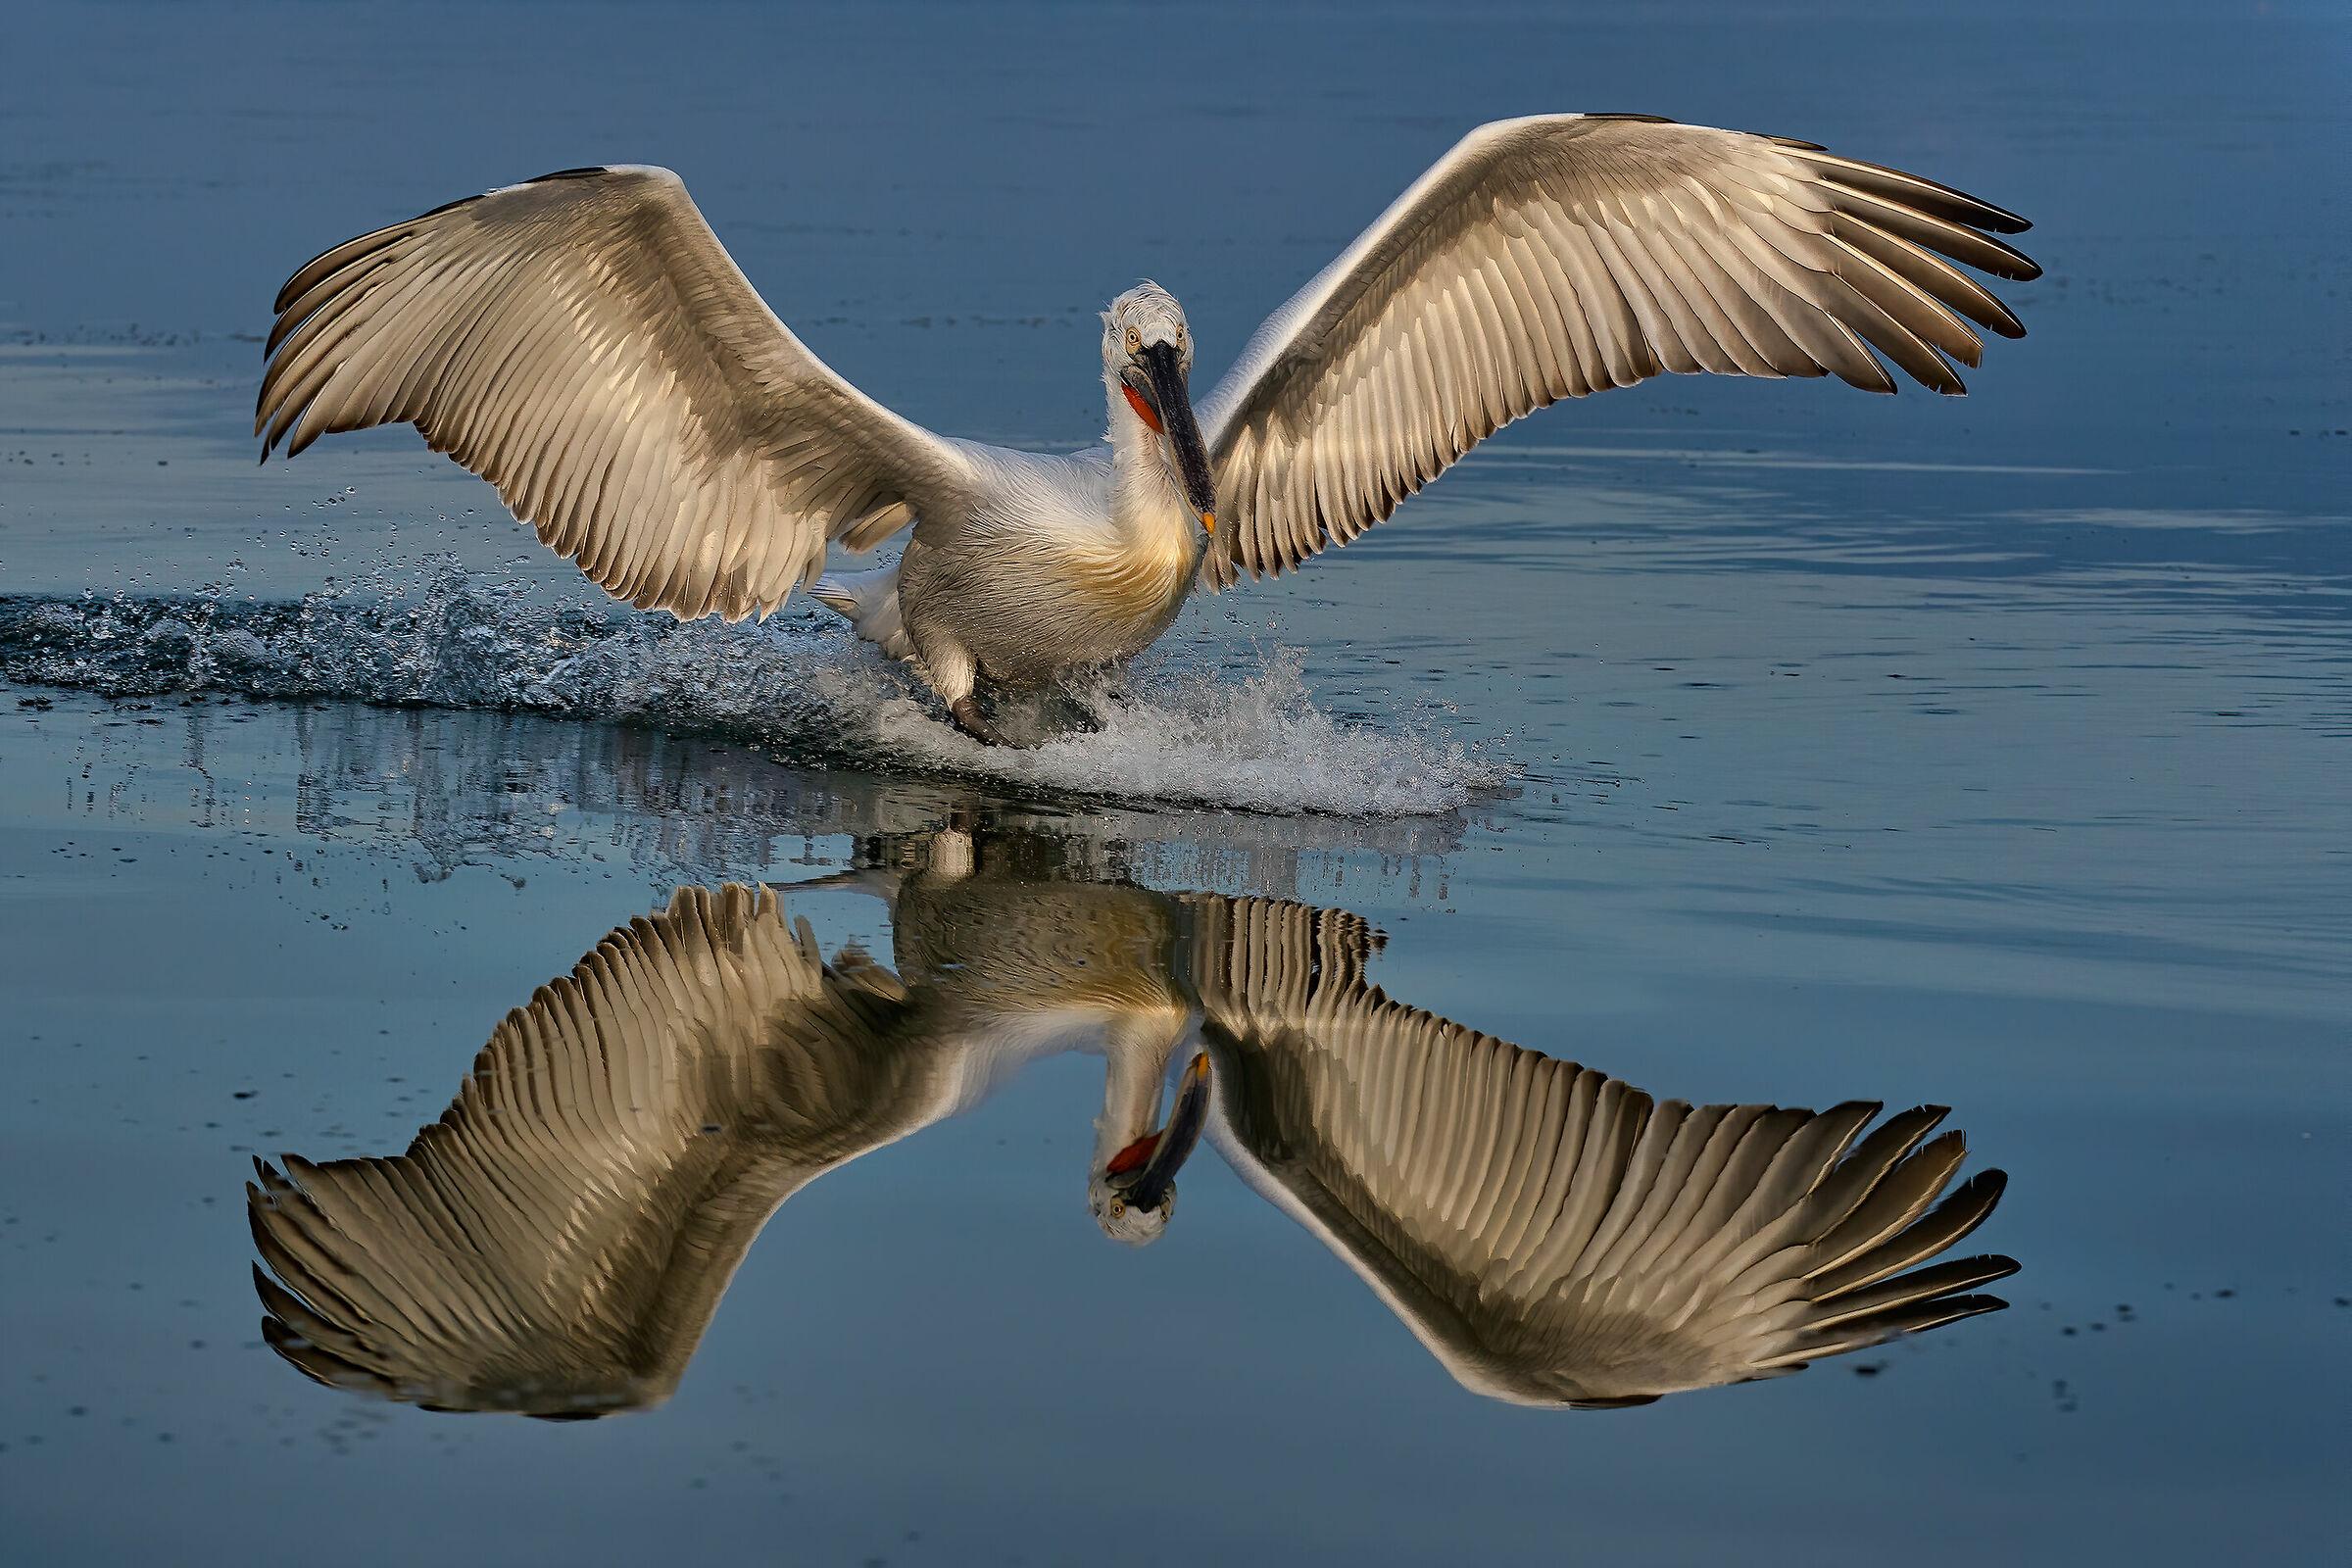 Landing...in a mirror...